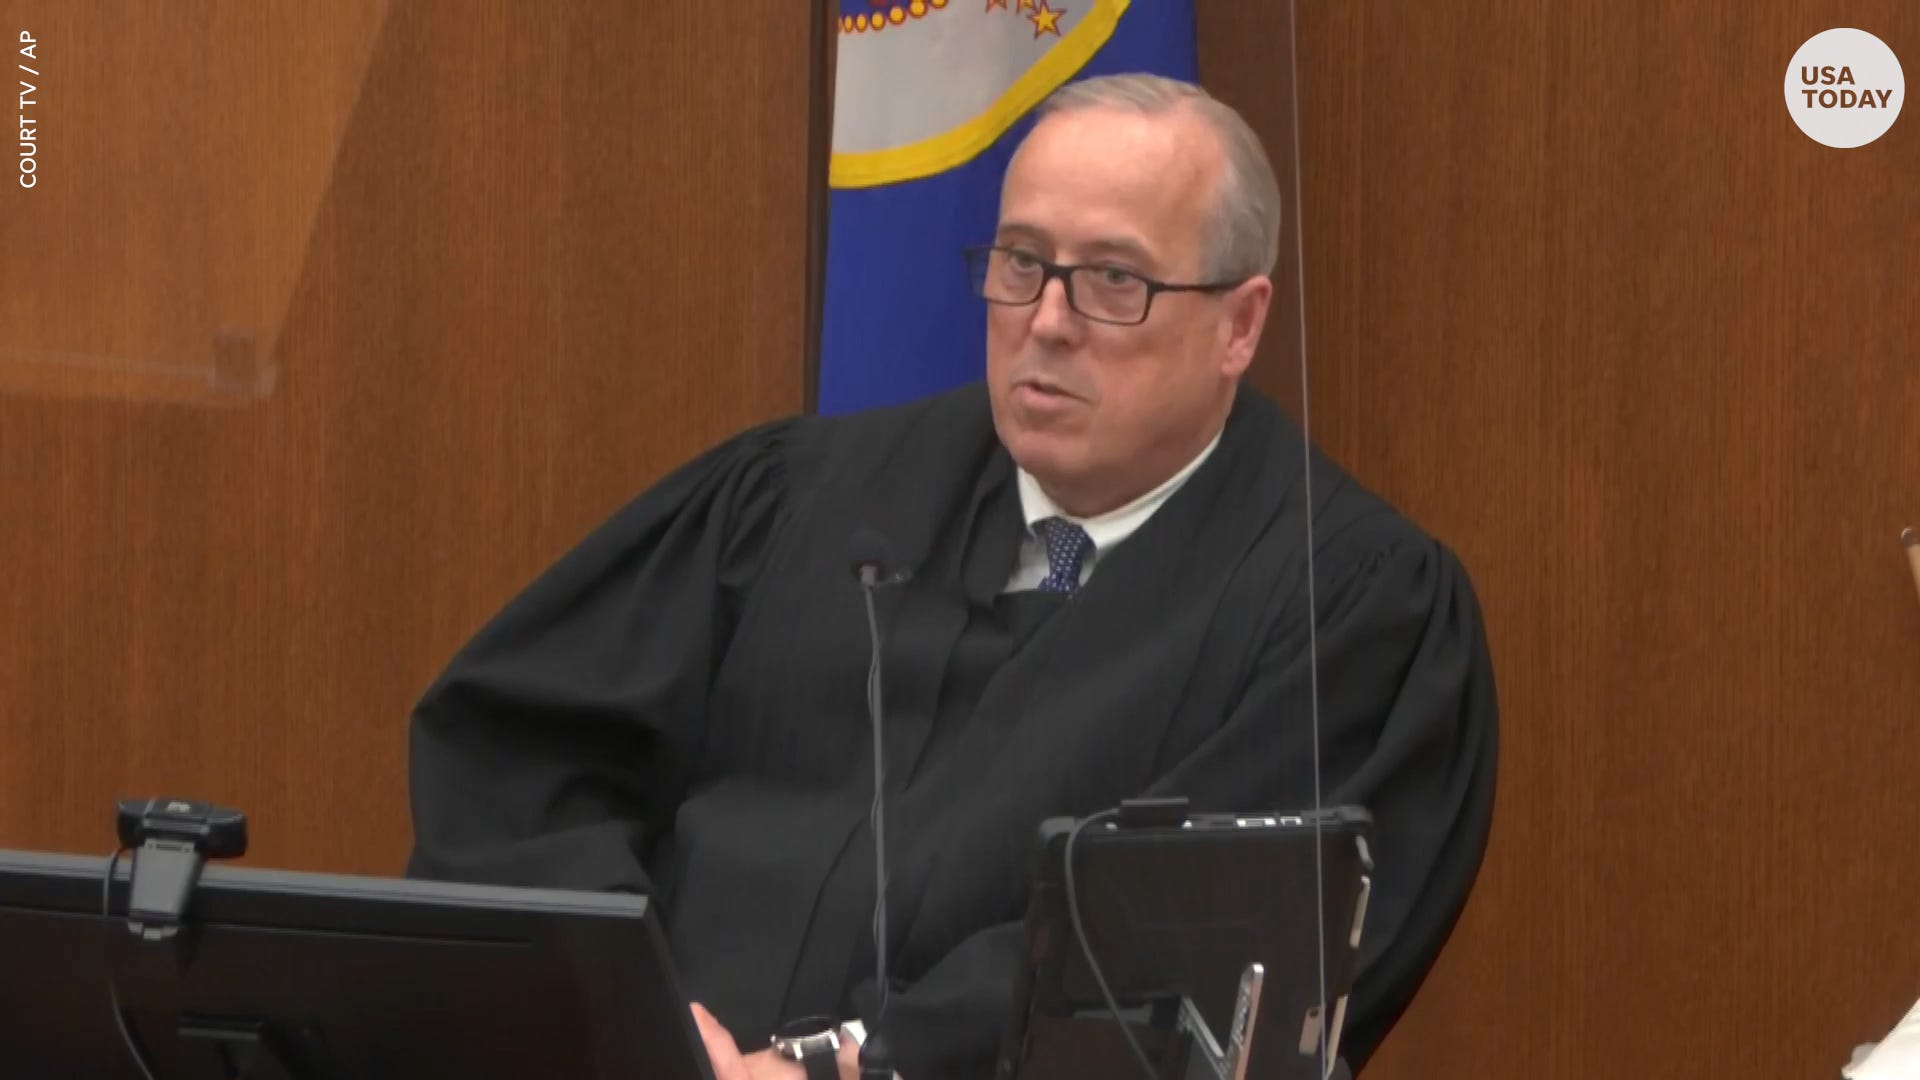 Chauvin Trial Judge Calls on Representative Maxine Waters for Comment, Denies Quash Request